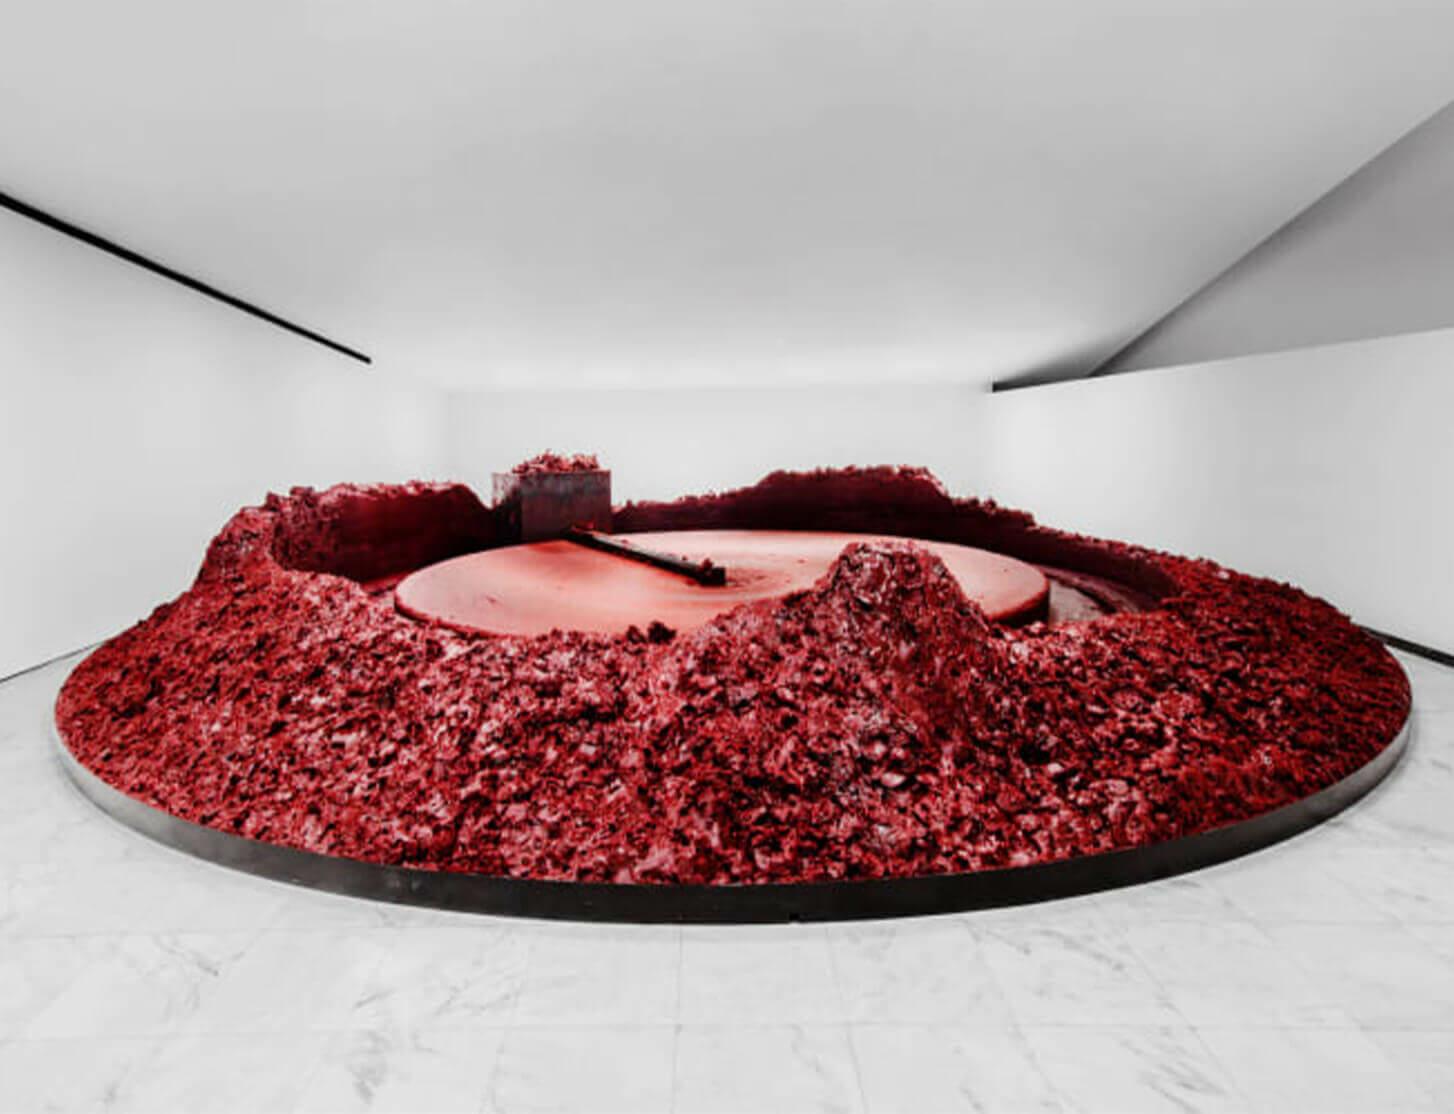 Outspoken artist Anish Kapoor opens retrospective in Beijing - CNN Style